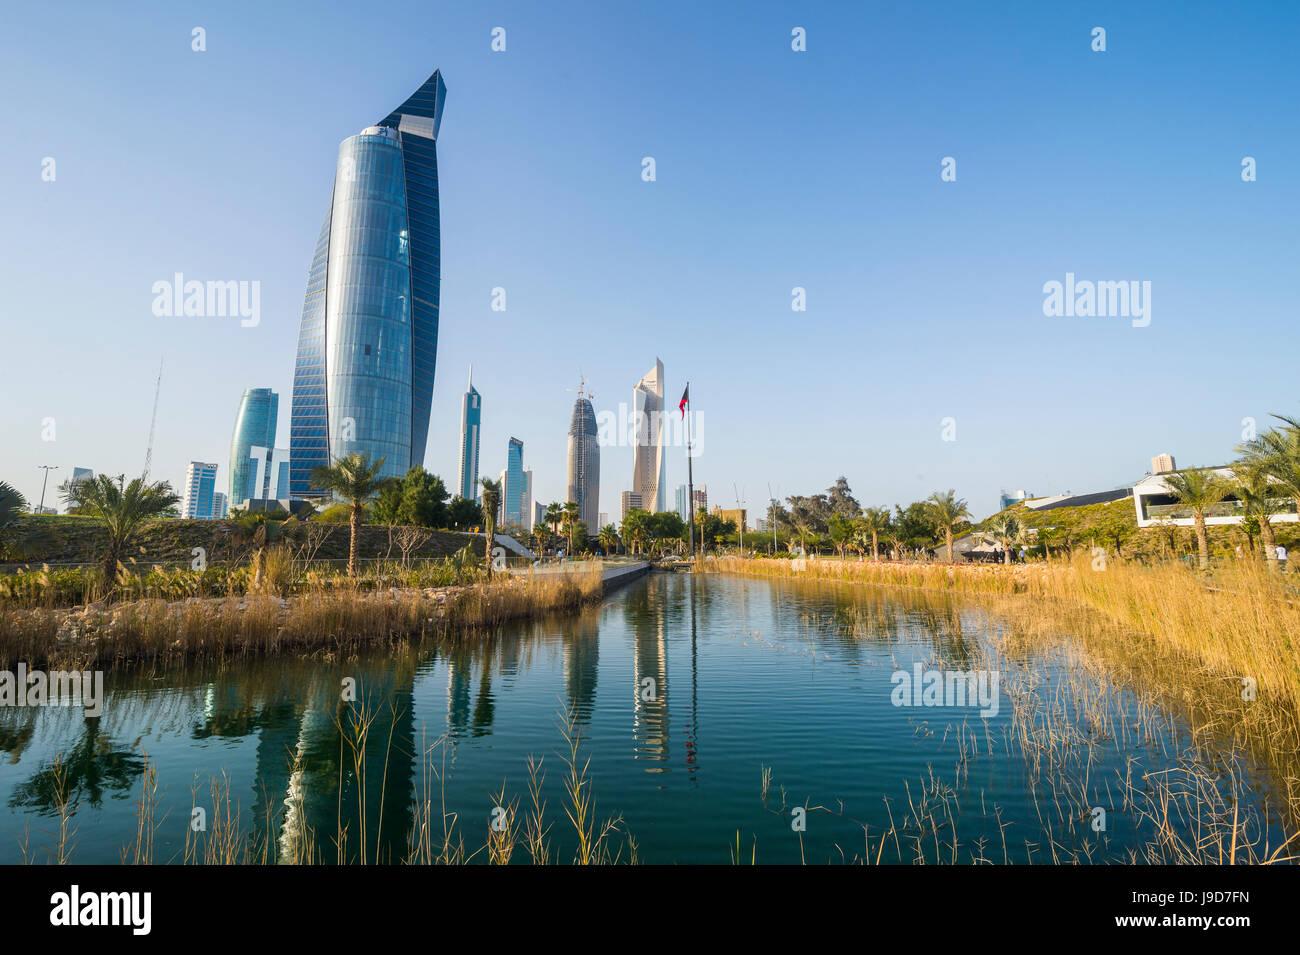 Al Hamra tower and the Al Shaheed Park, Kuwait City, Kuwait, Middle East - Stock Image